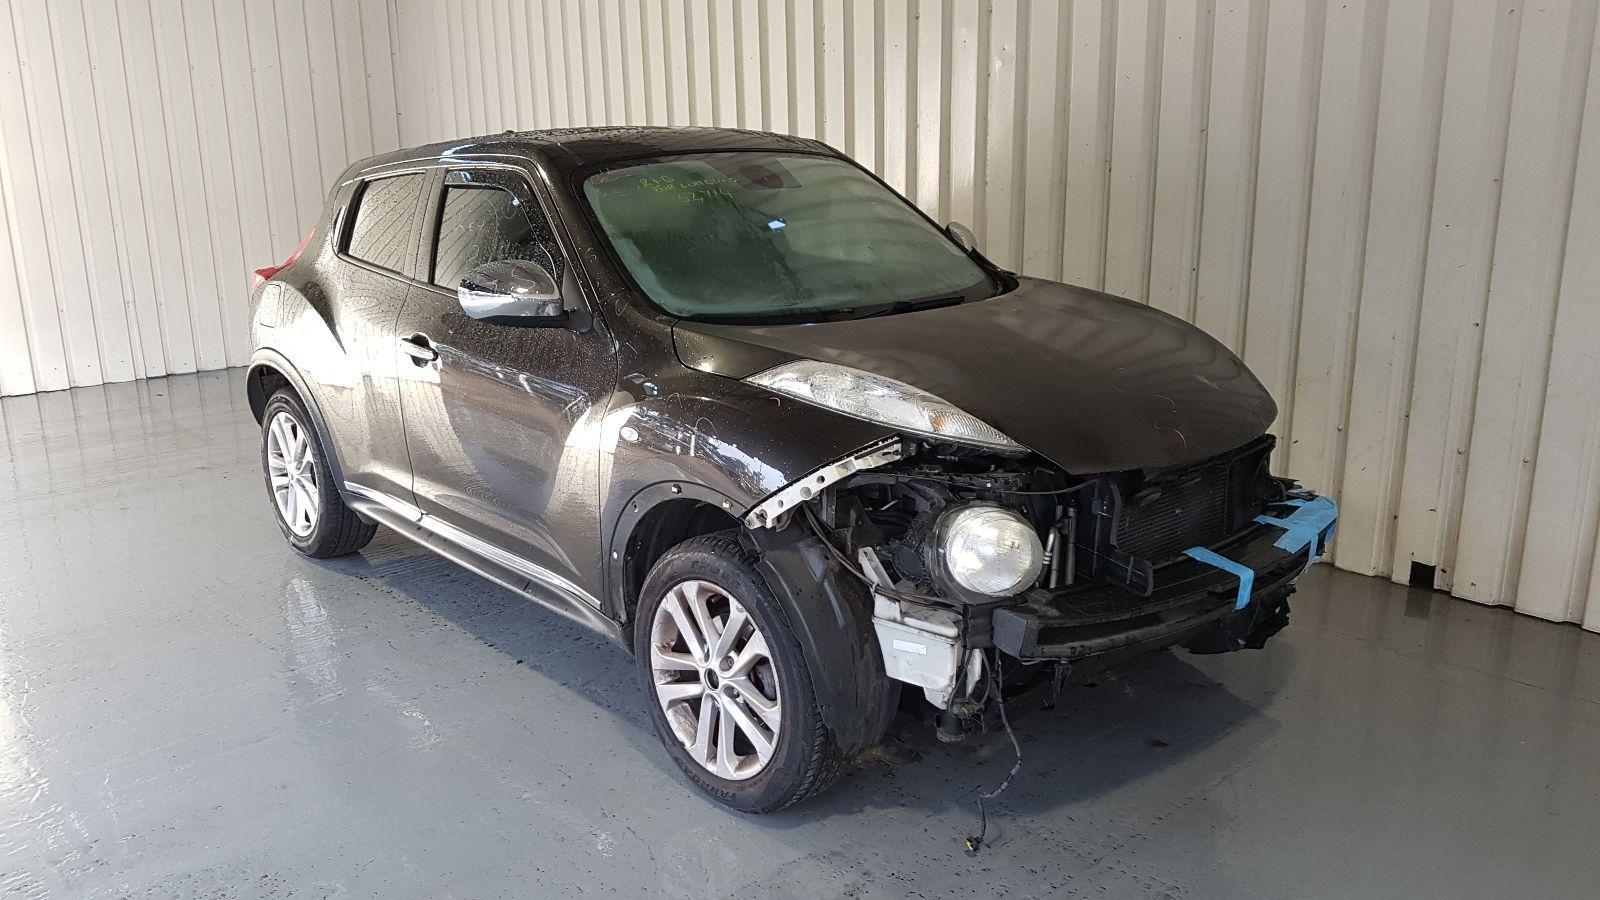 Image for a Nissan Juke 2010 5 Door Hatchback Breaking